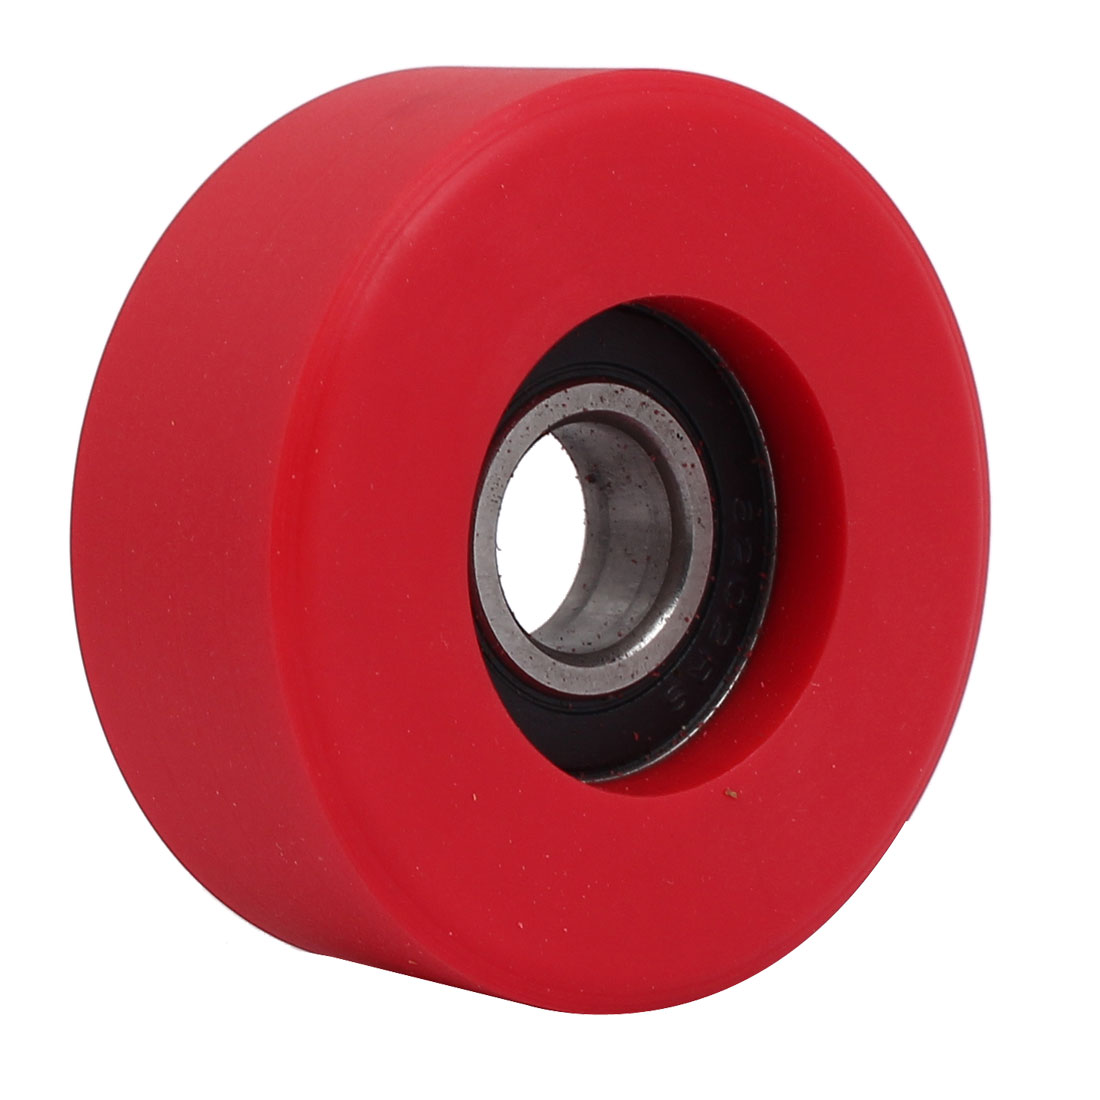 15mm x 58mm x 24mm PU Roller Bearing Pulley Sliding Converyor Wheel